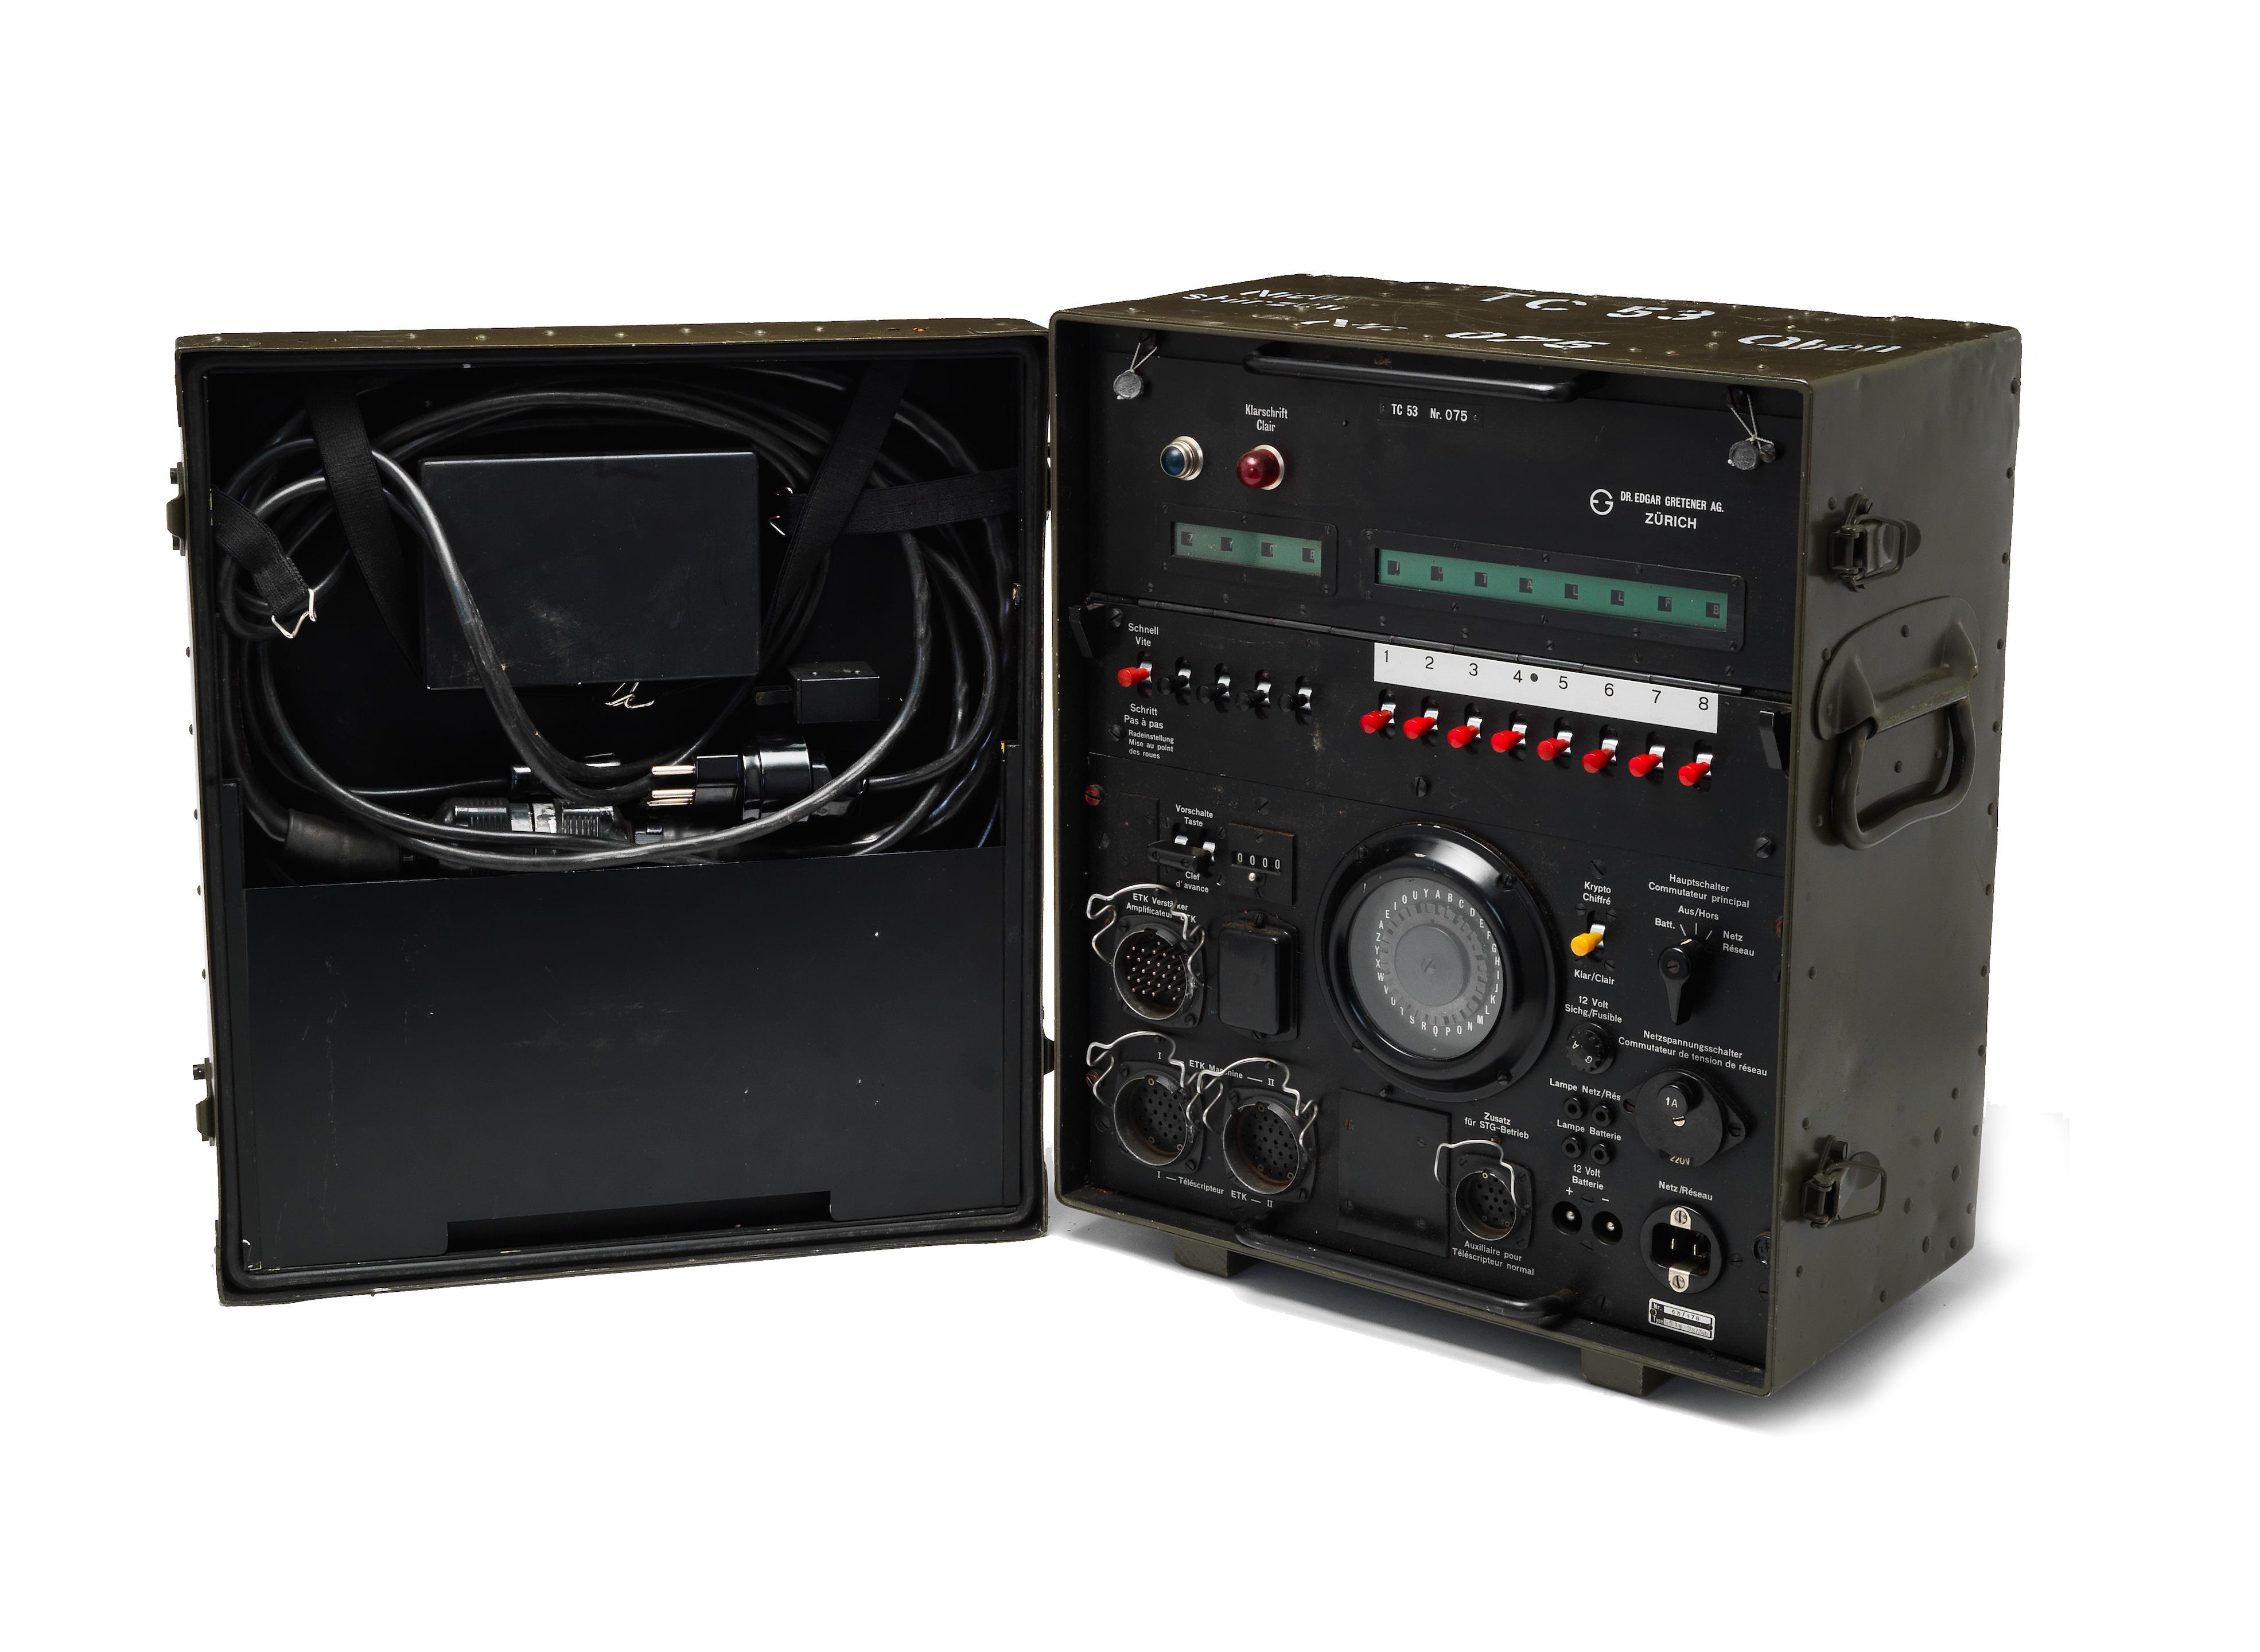 A Telecrypto 53 electromechanical wheel-based cipher machine,